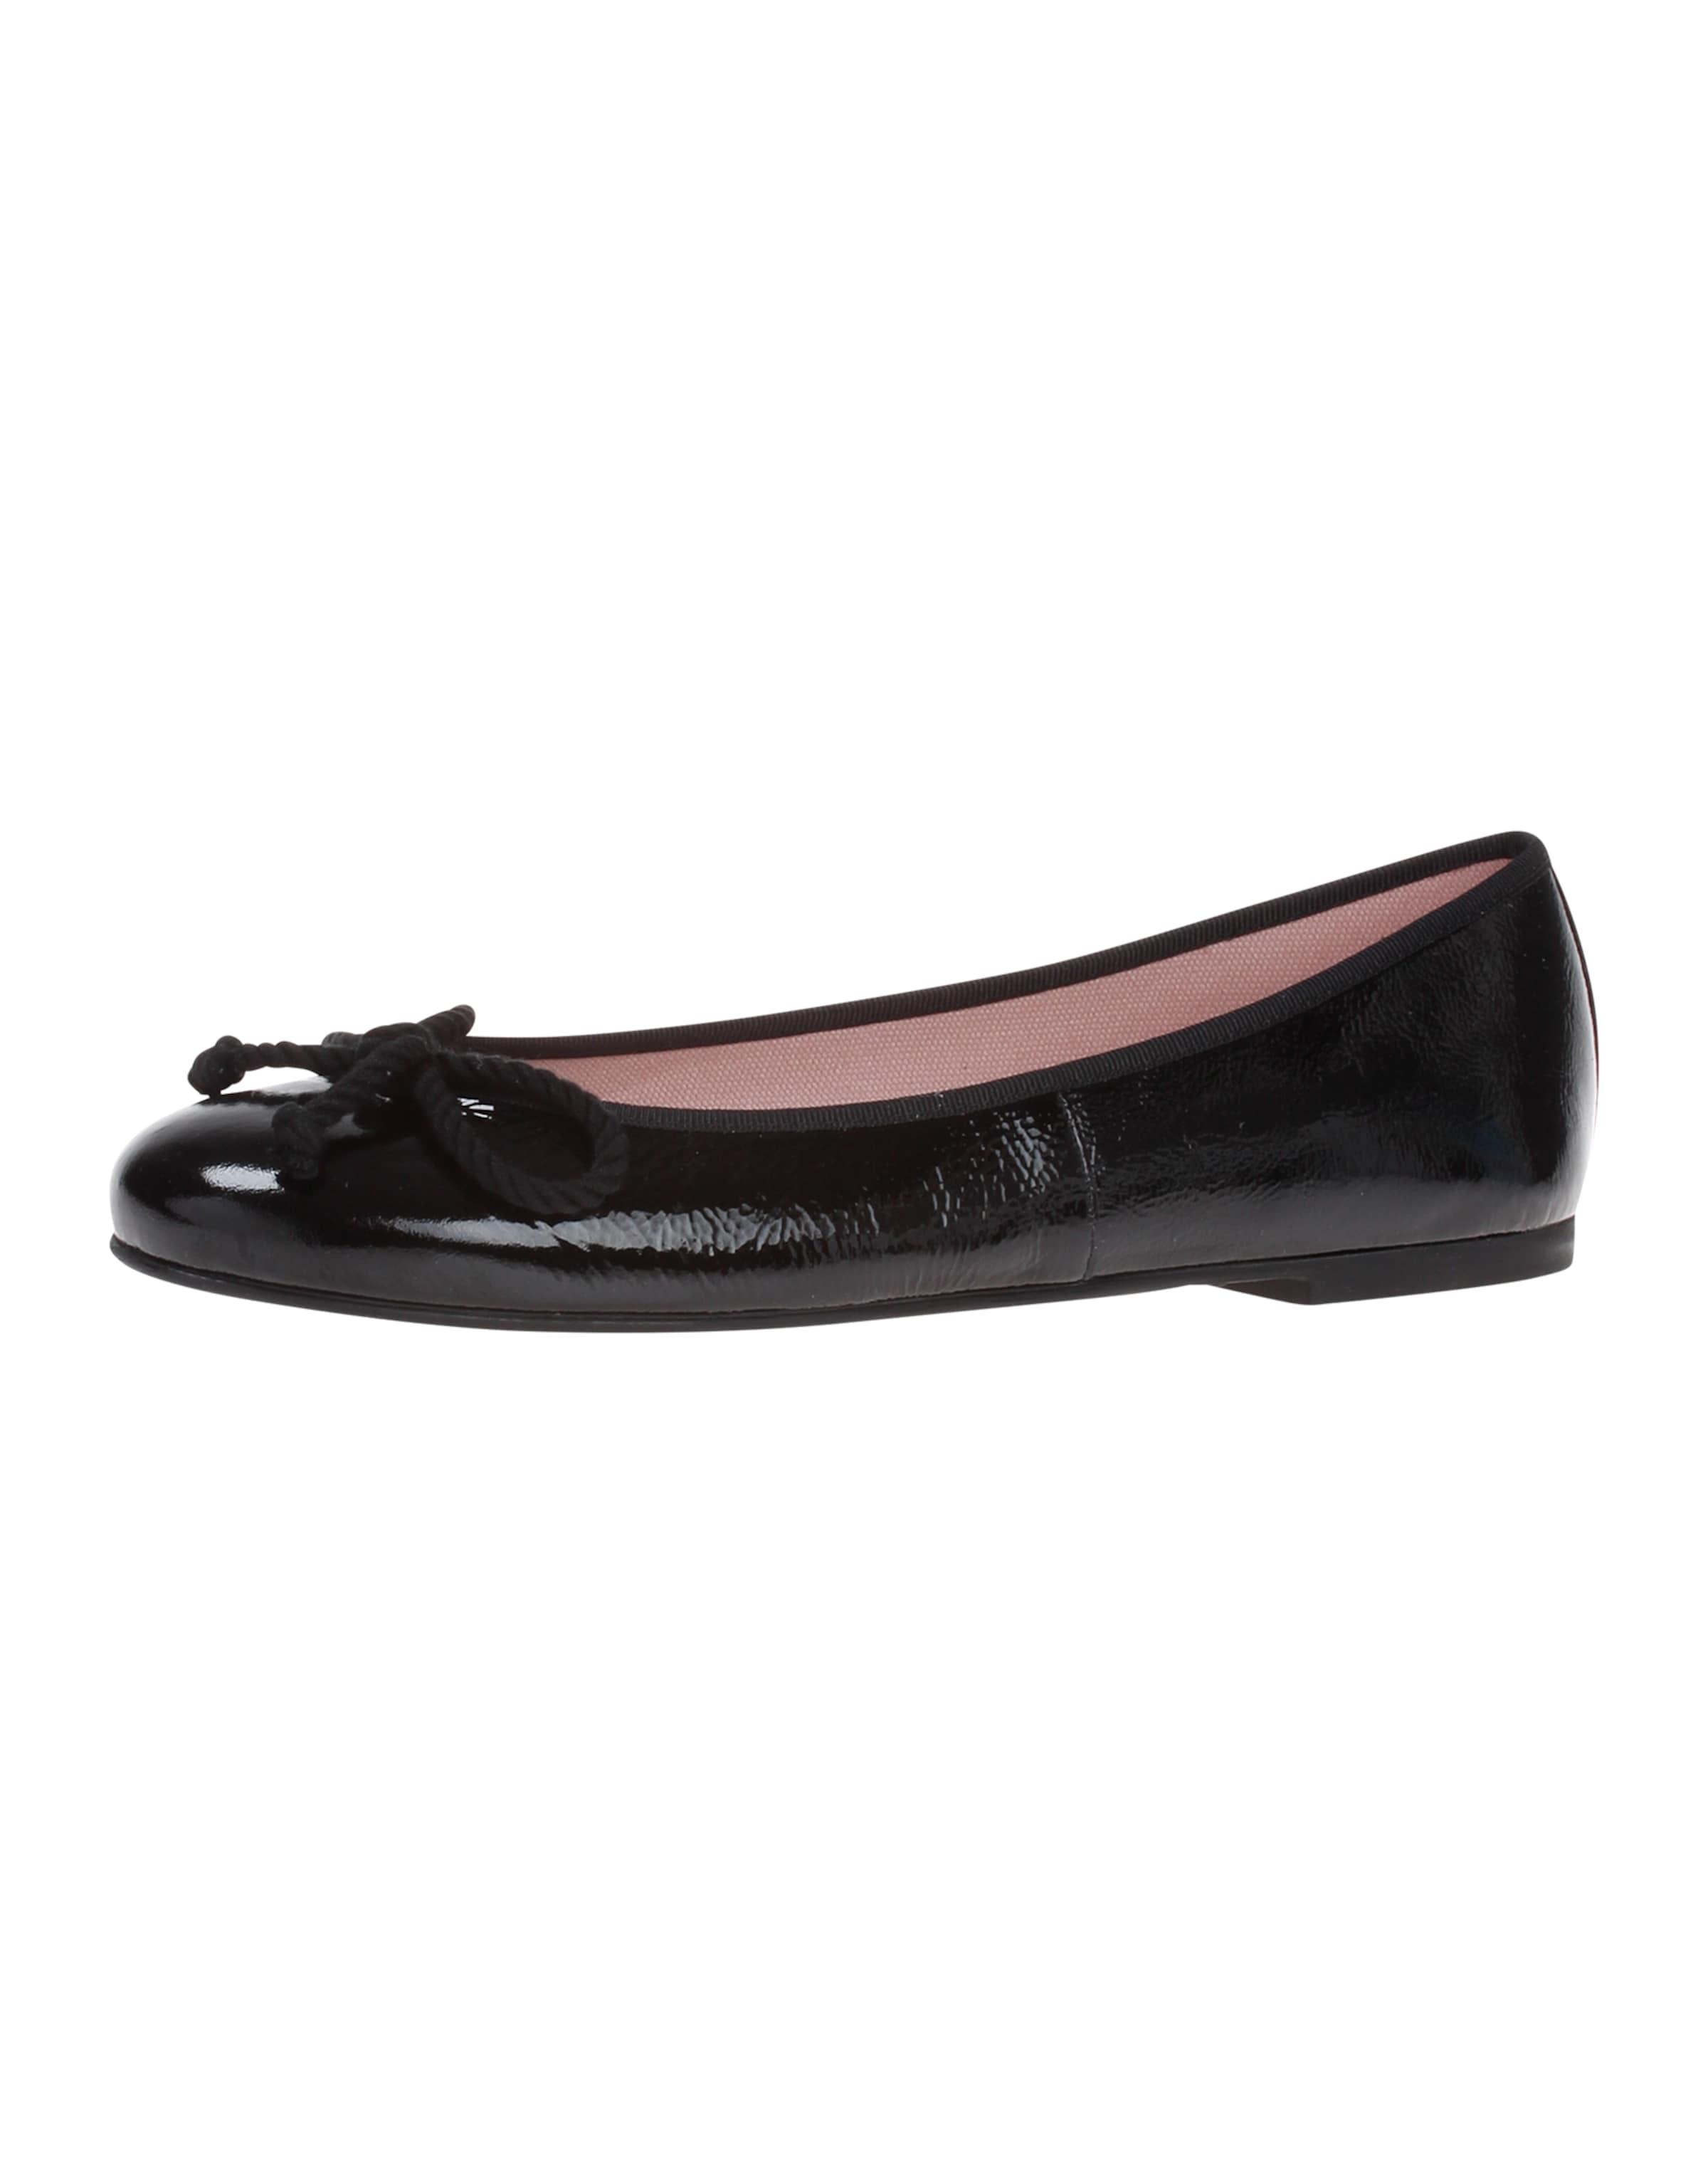 Haltbare Mode billige Schuhe PRETTY BALLERINAS | Ballerina 'Ipnotic' Schuhe Gut getragene Schuhe